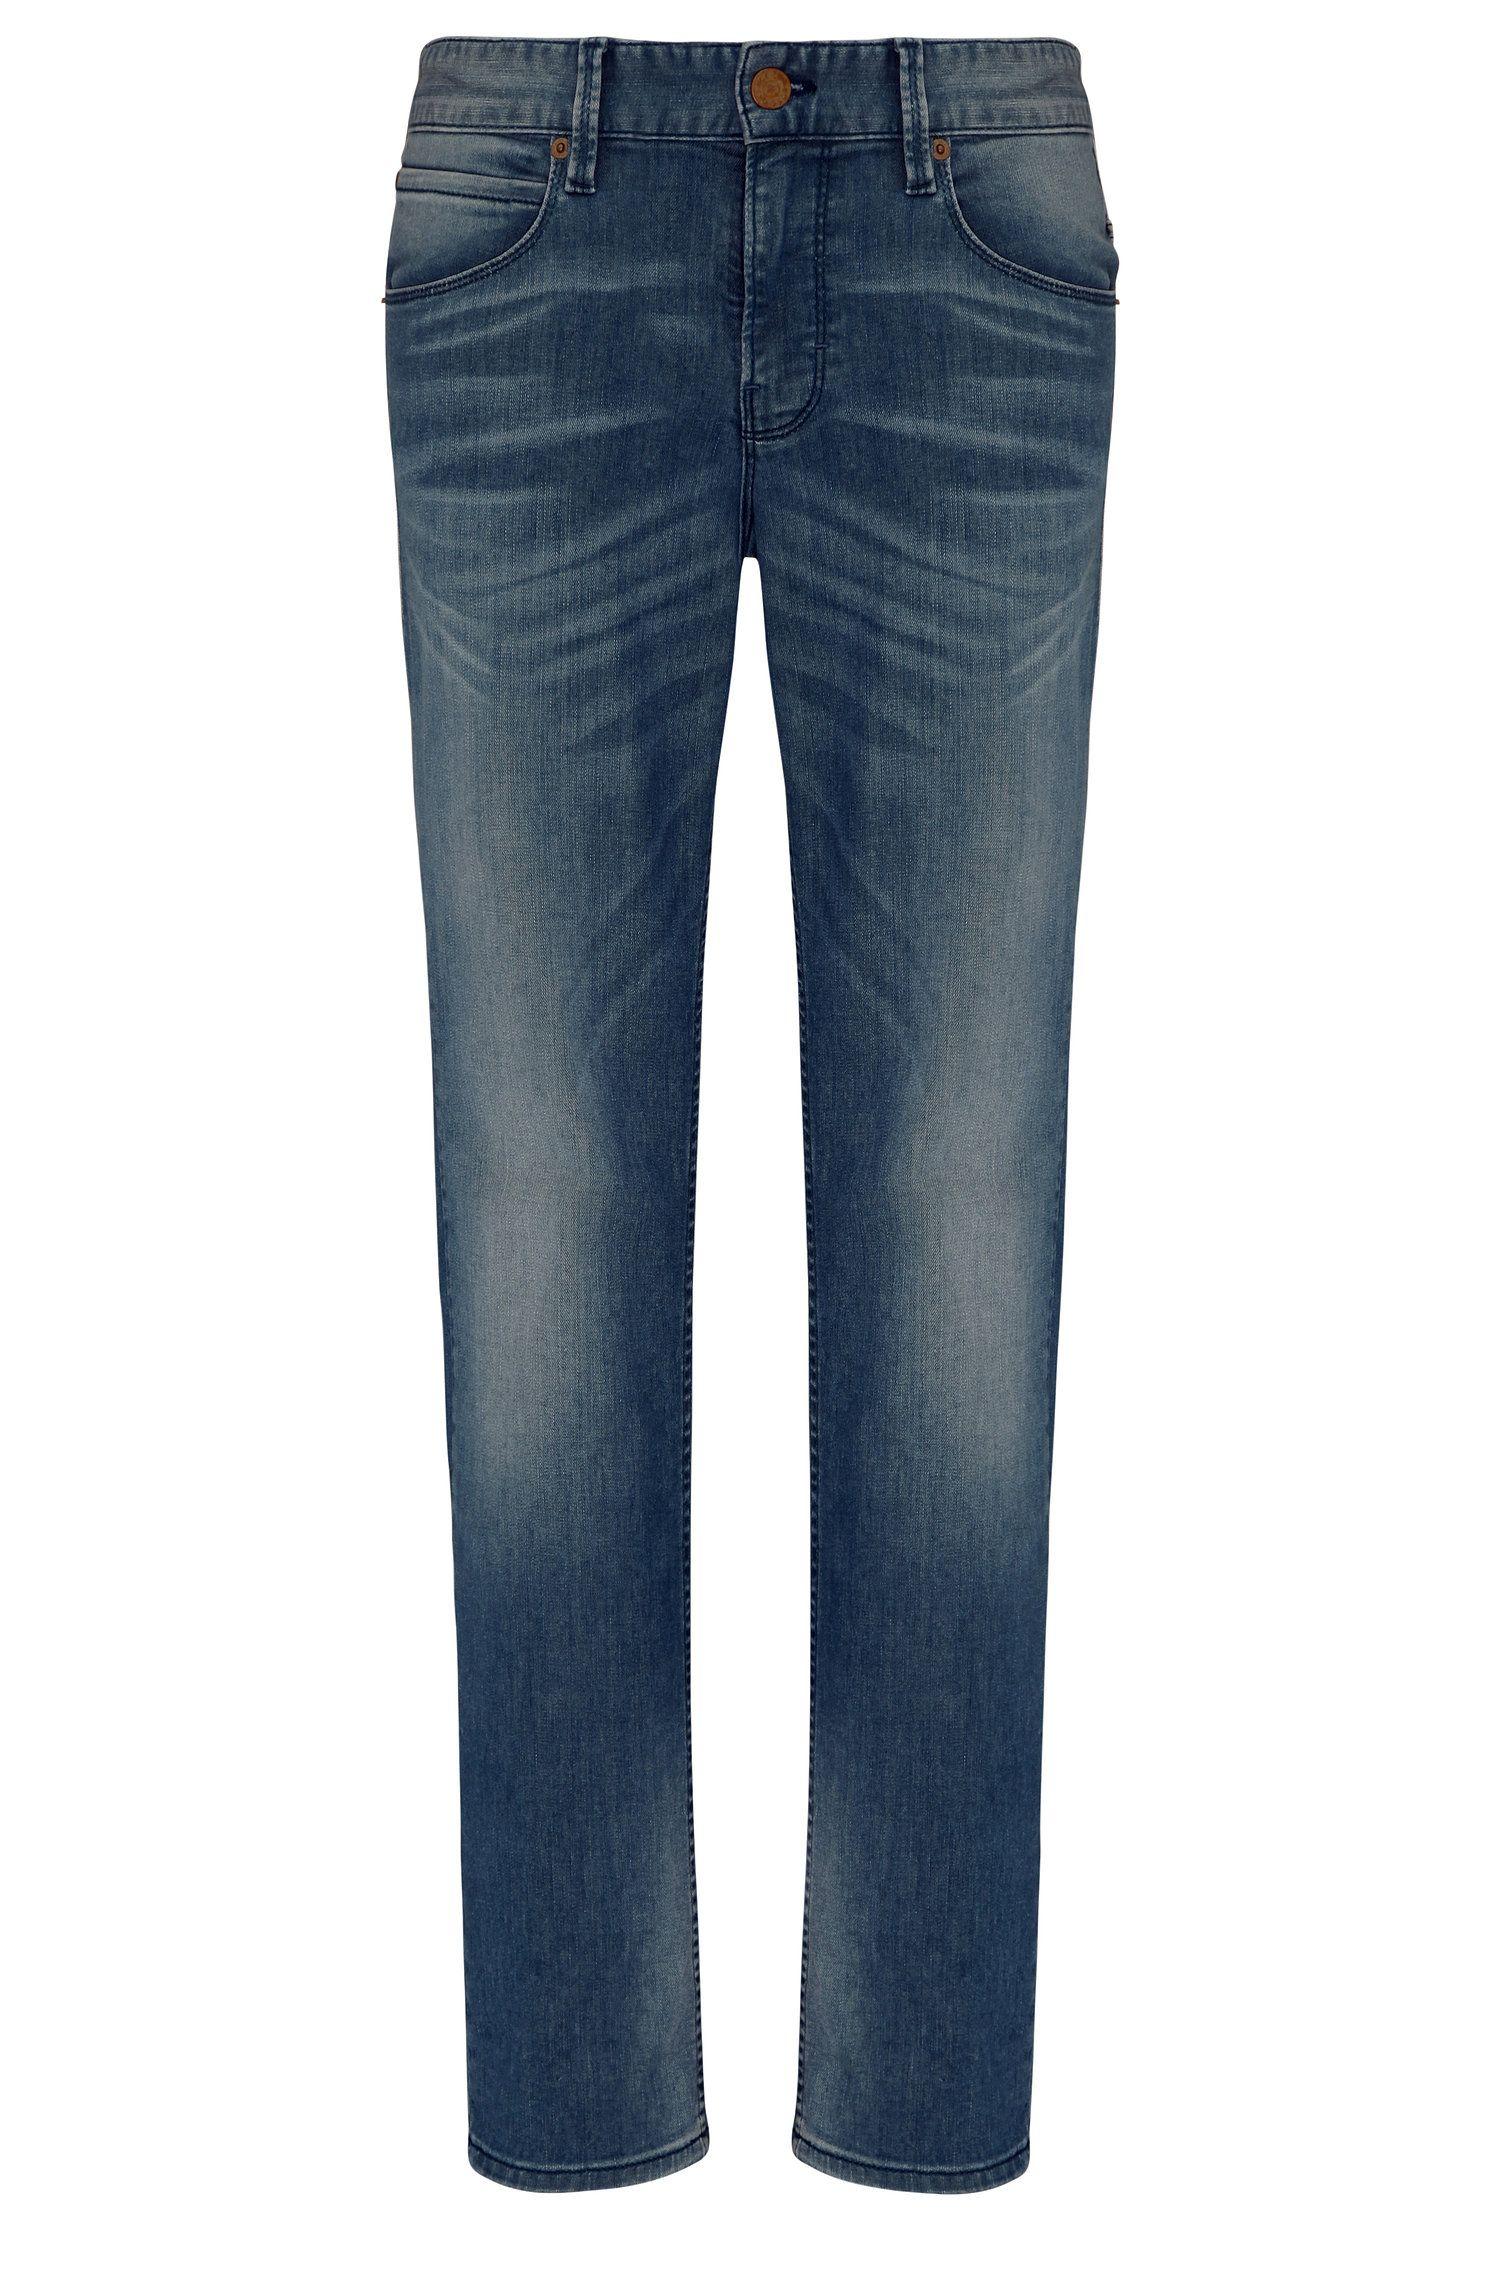 'Orange 63' | Slim Fit, 10 oz Stretch Cotton Blend Jeans